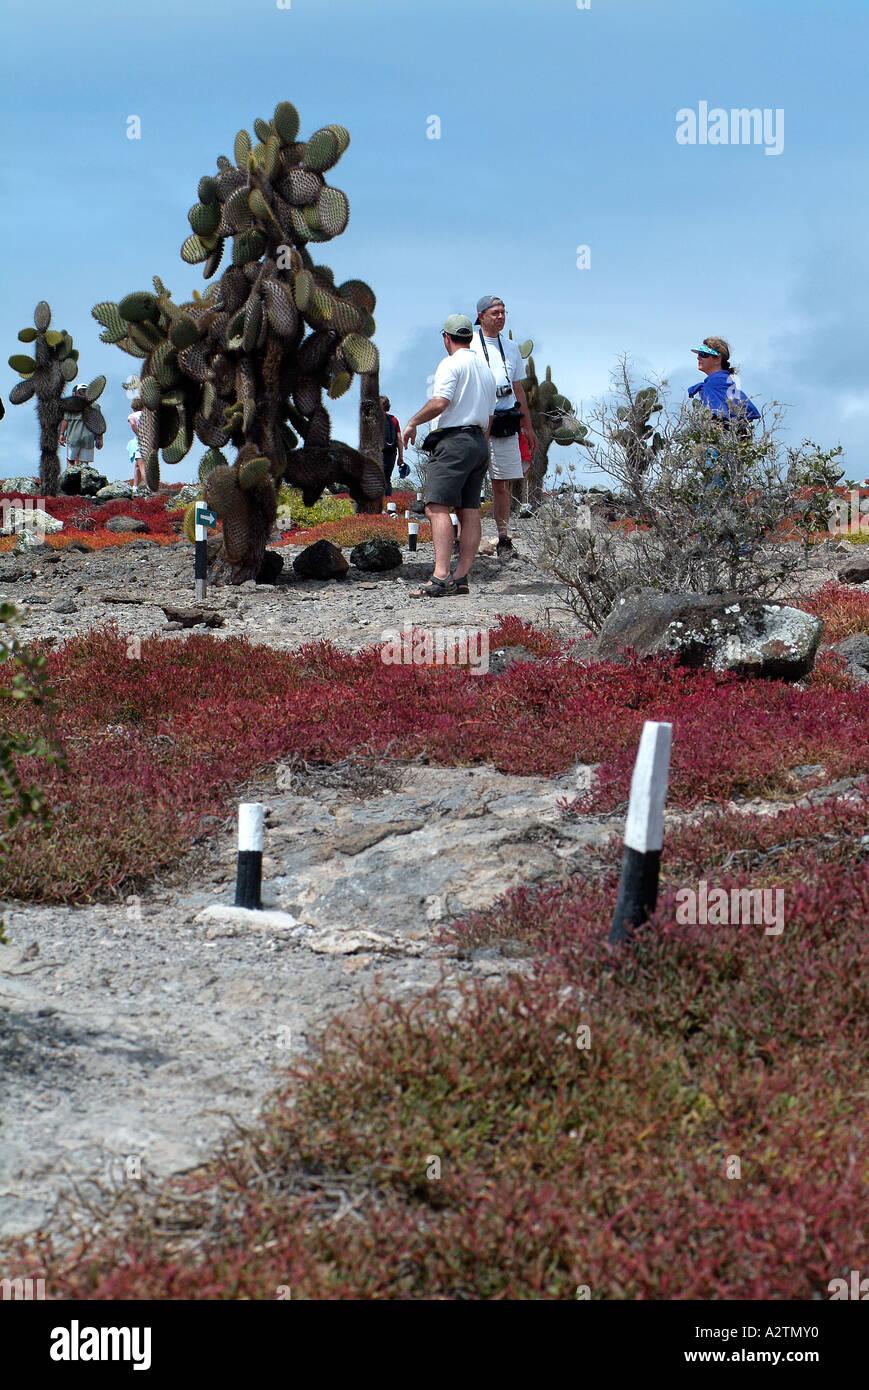 Plaza Island in the Galapagos Archipelago Stock Photo